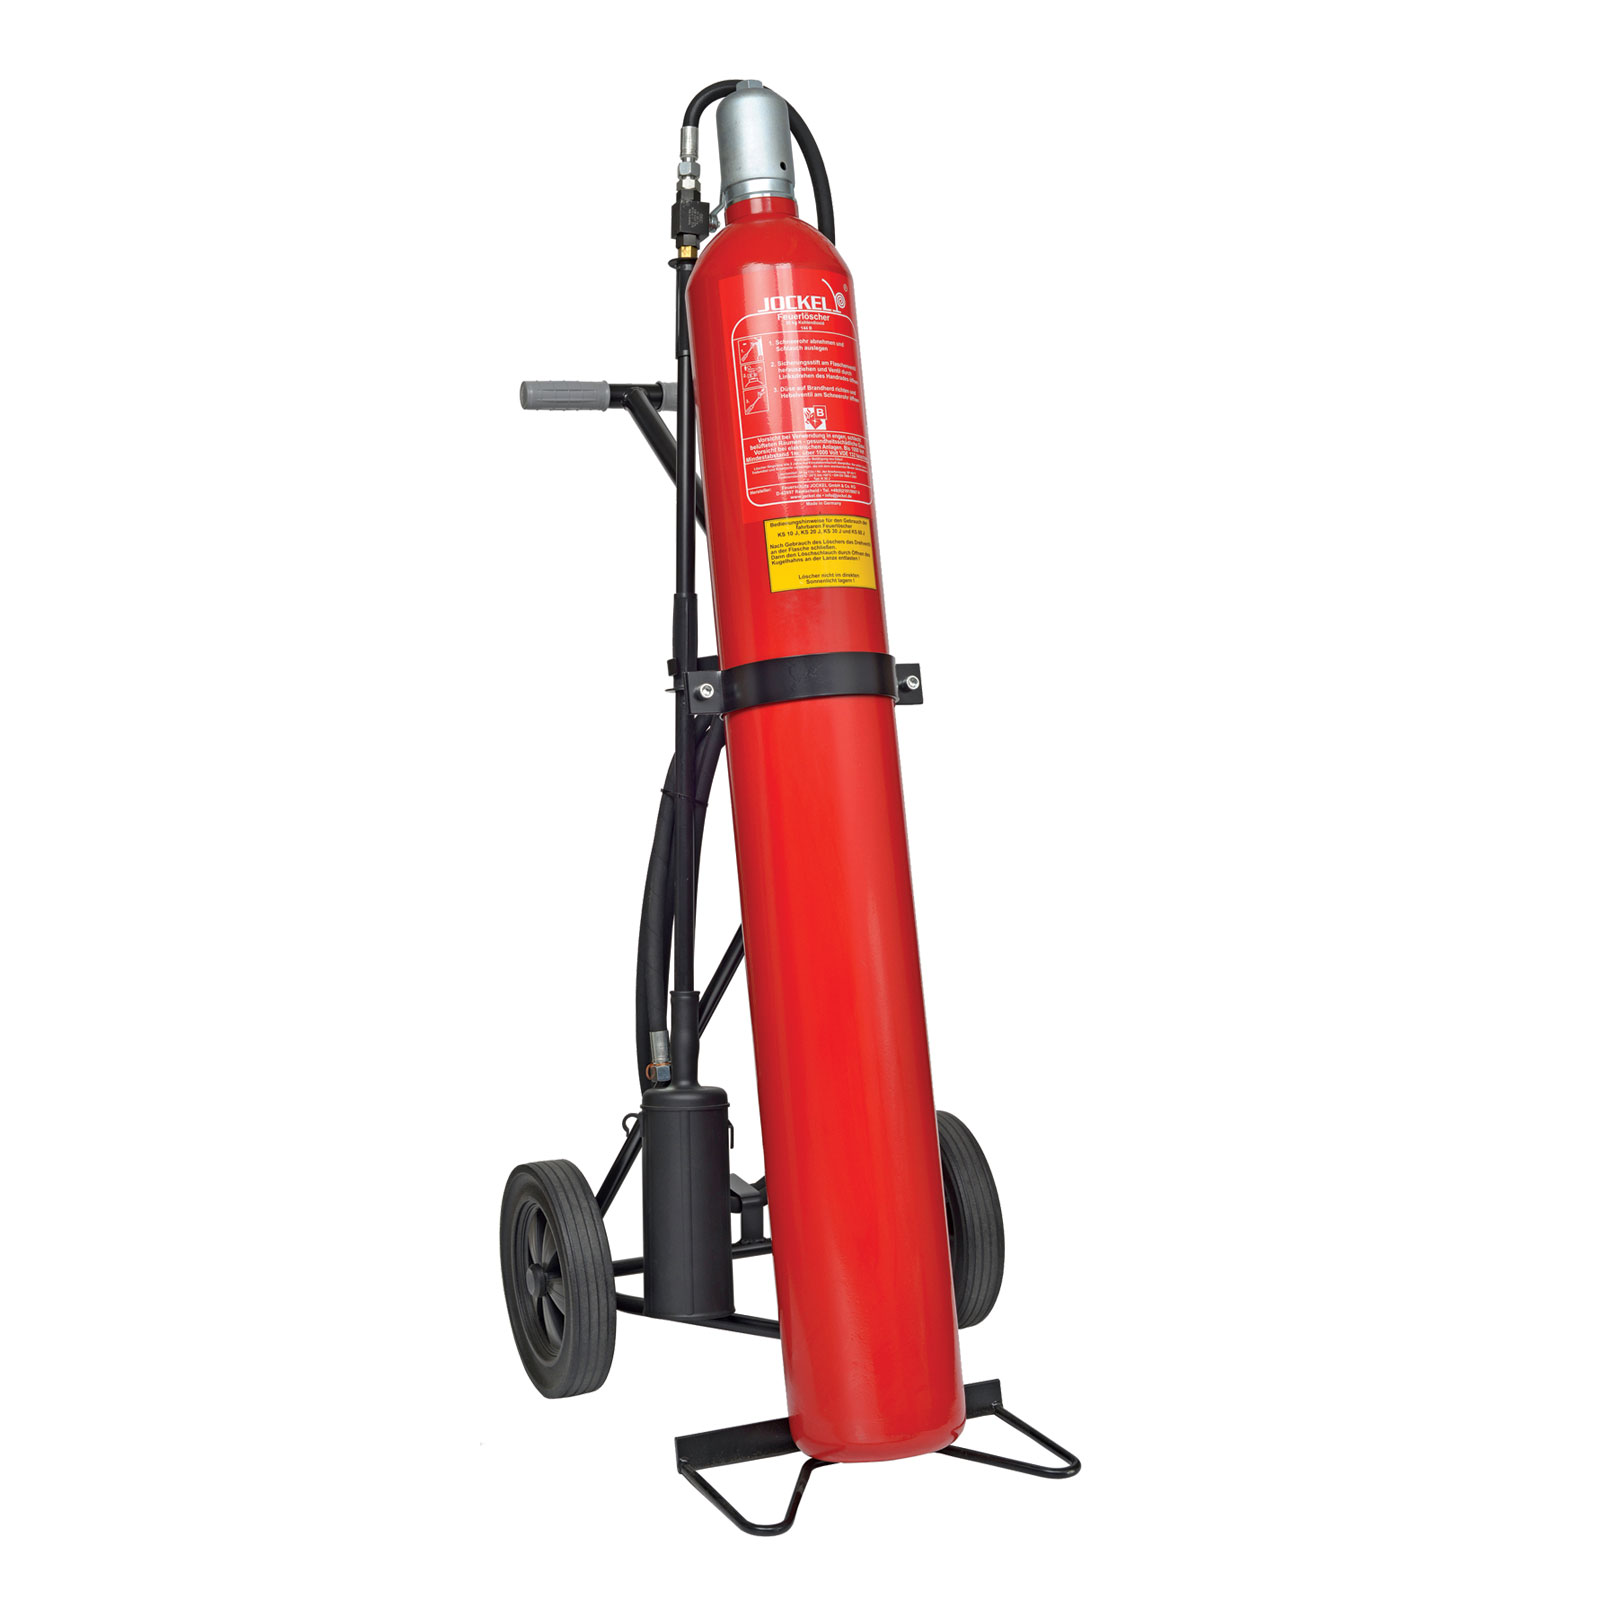 کپسول آتش نشانی جوکل CO2 چرخدار